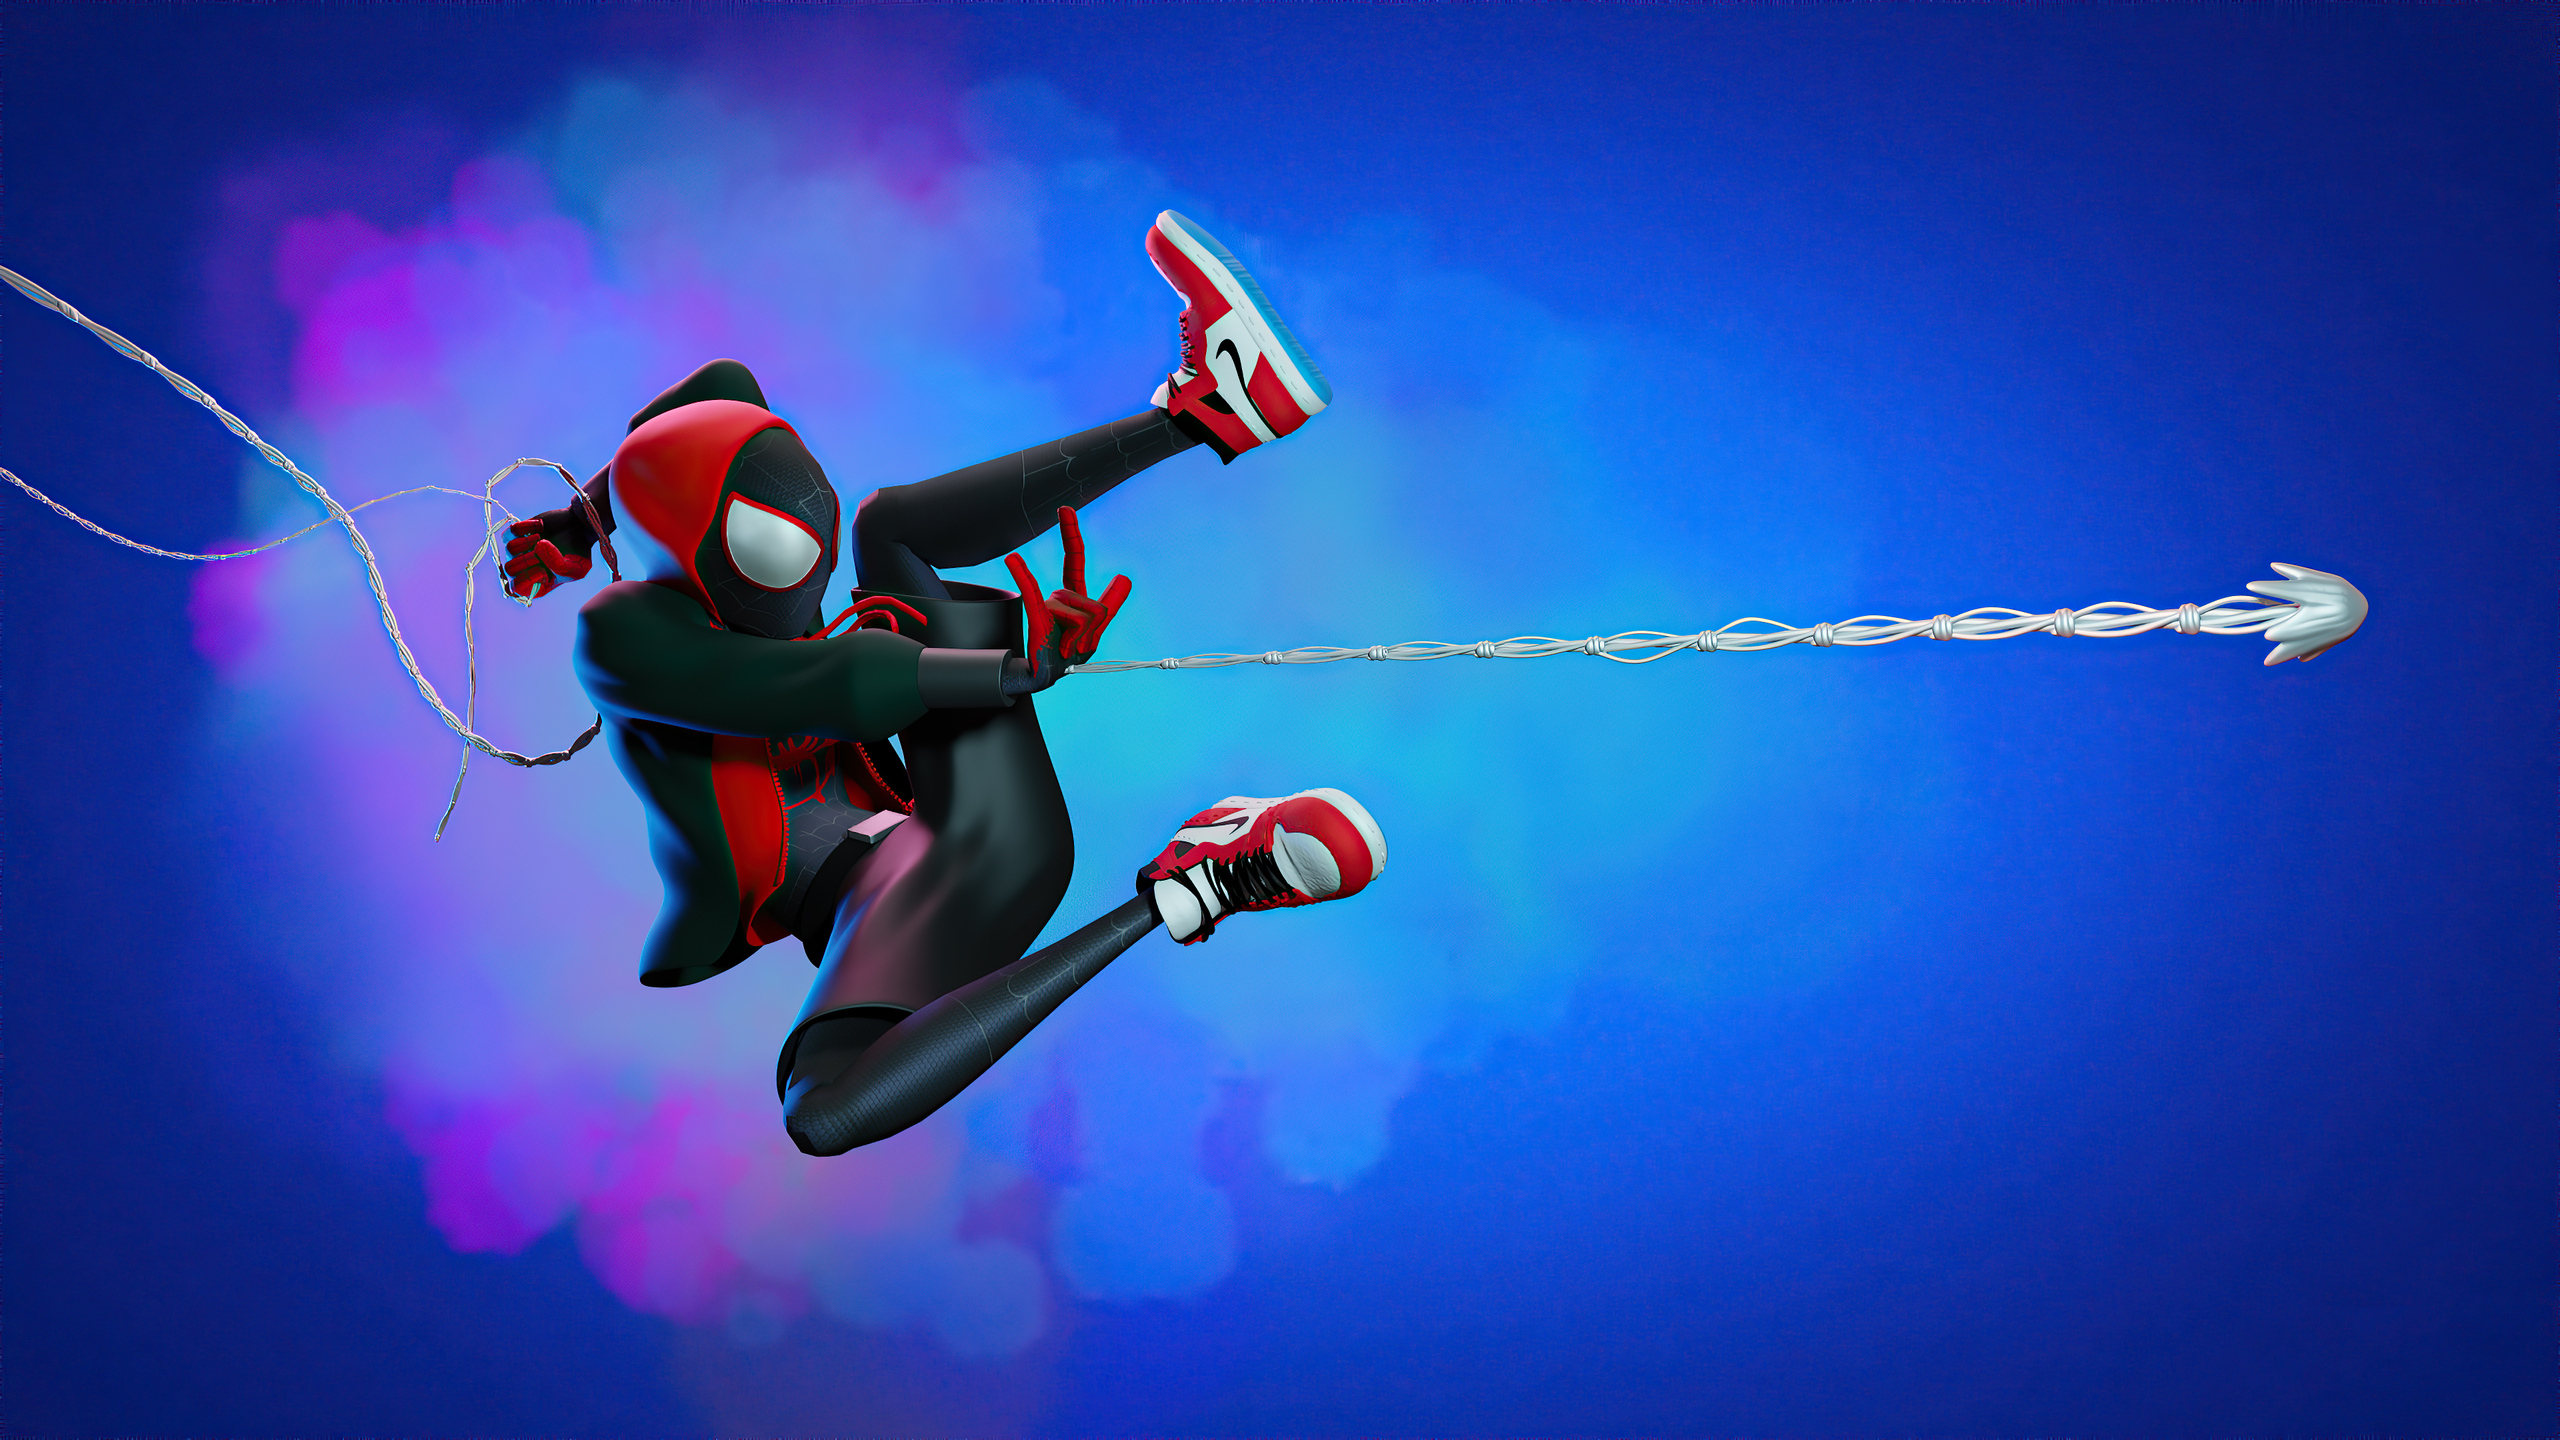 2560x1440 Spider Man Miles Web Shooter Artwork 1440P ...